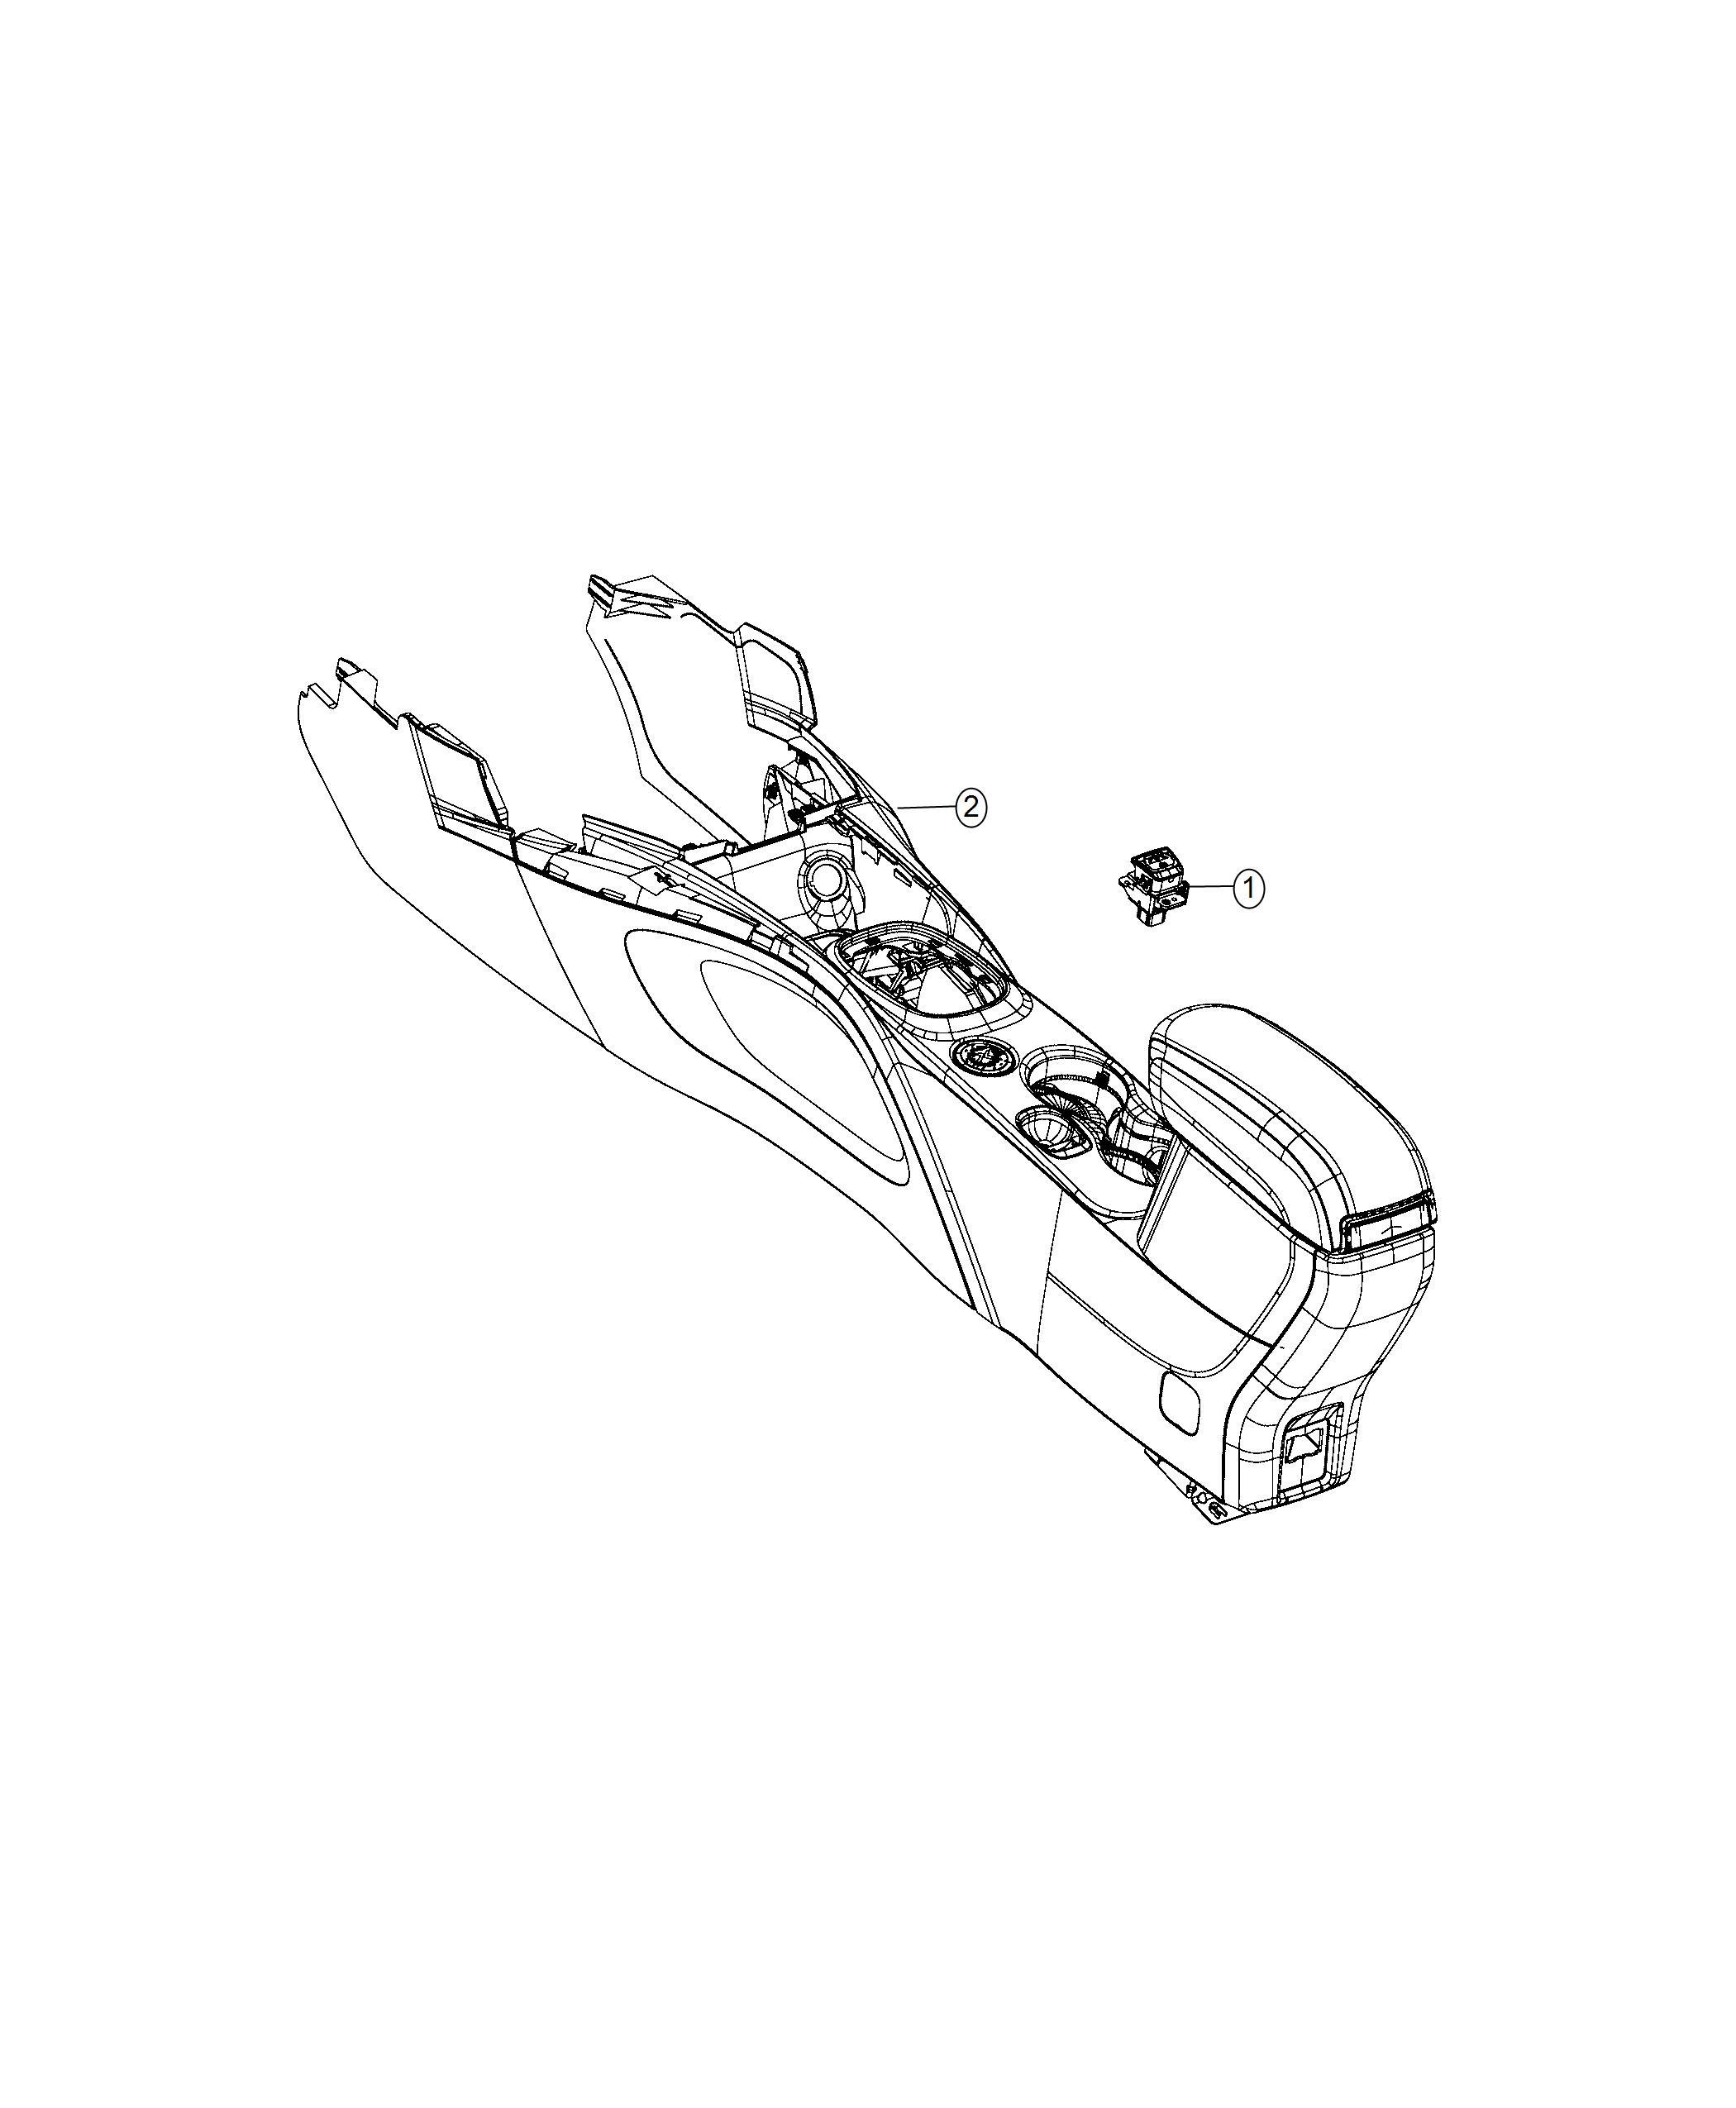 Fiat 500x Switch  Brake  Electric Park Brake  Canada